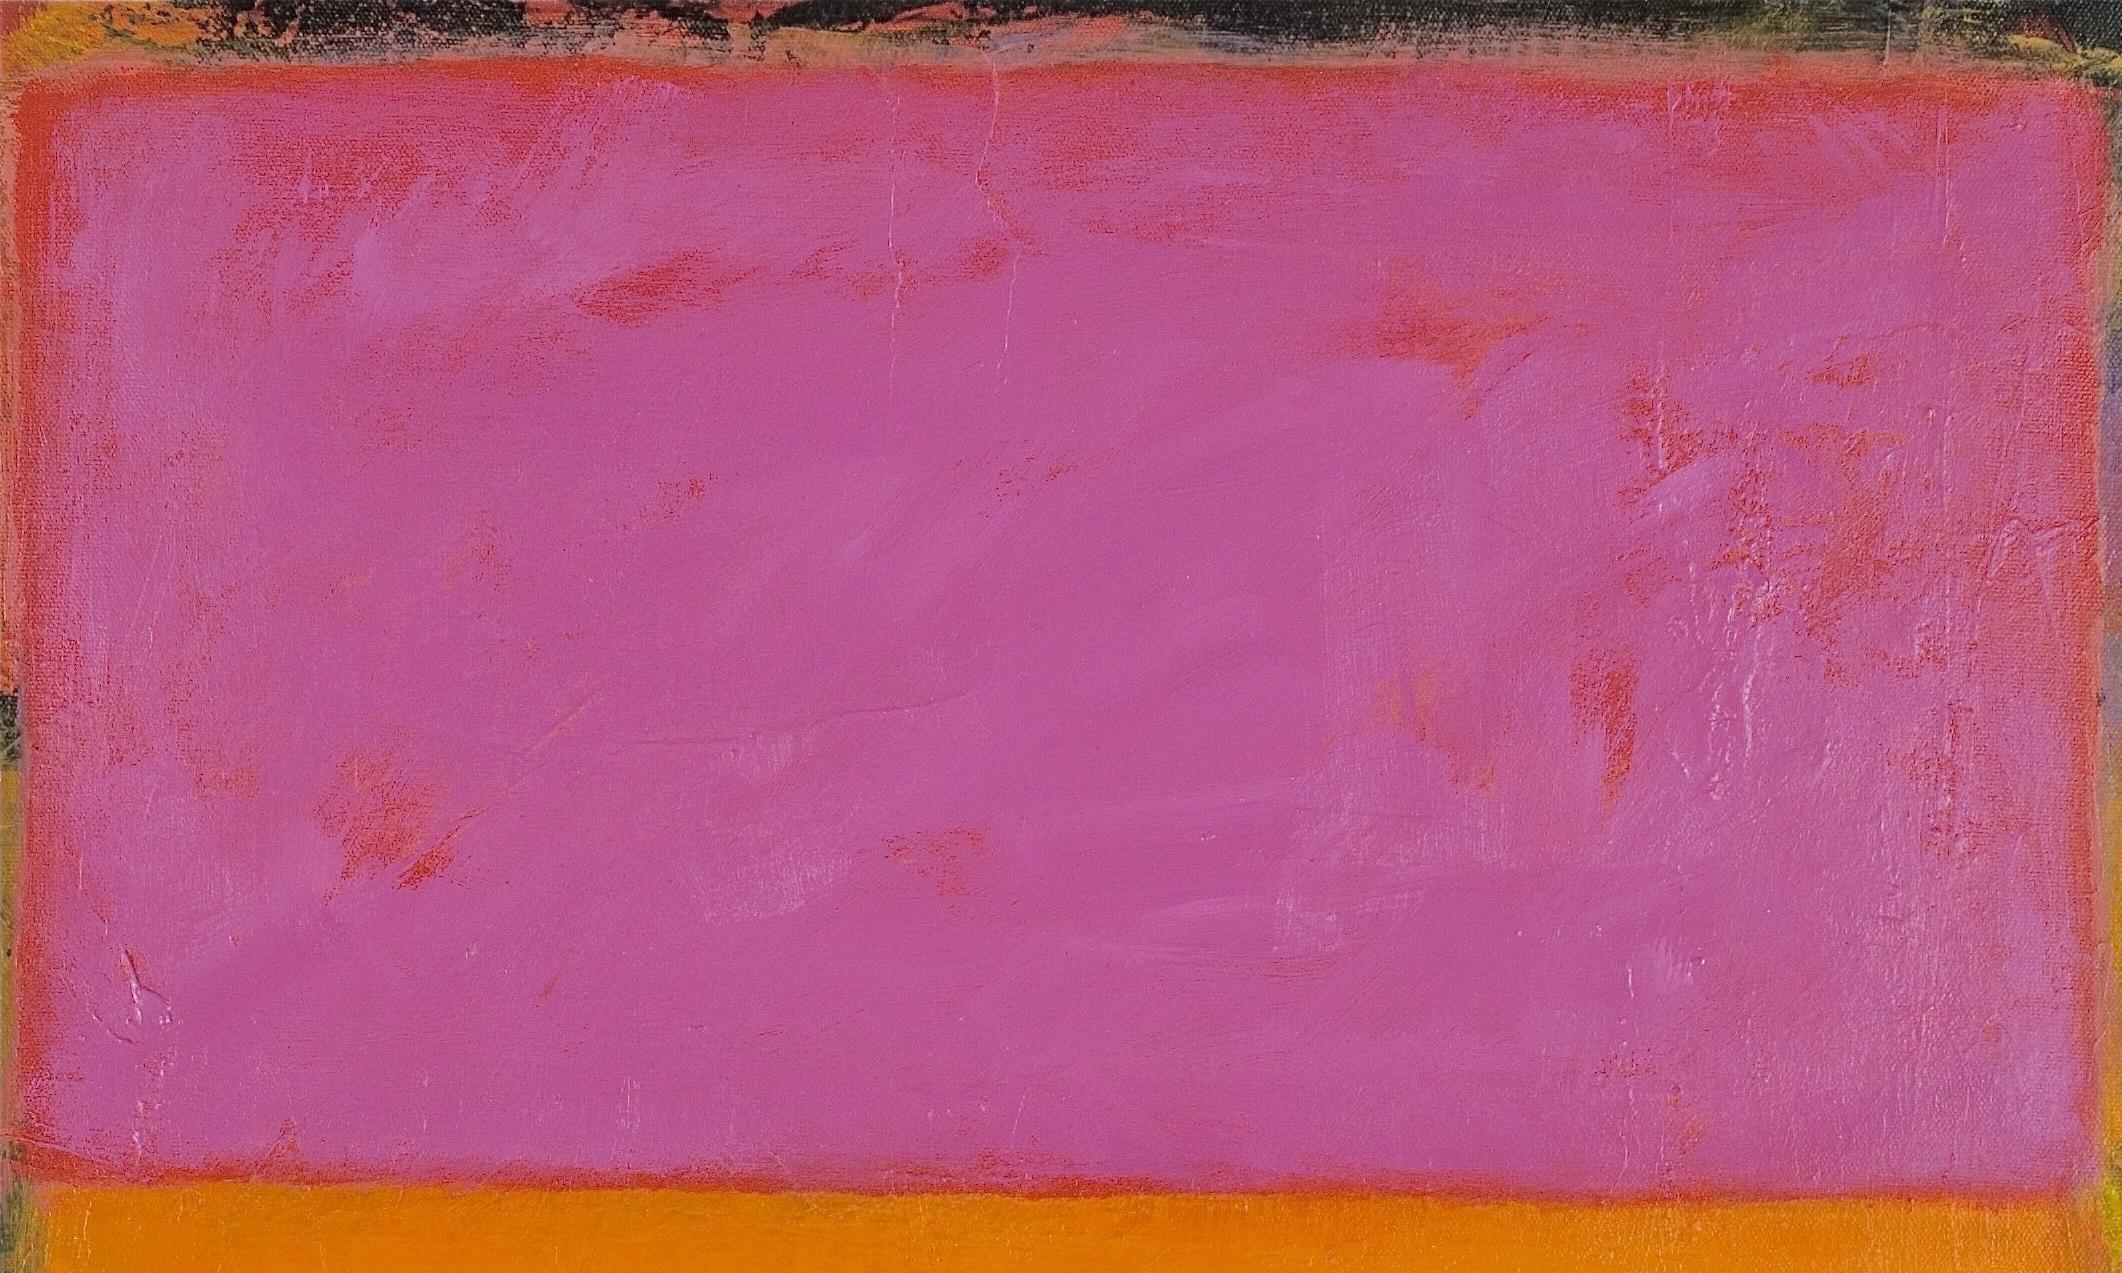 Randee Levine, 2005 (detail)